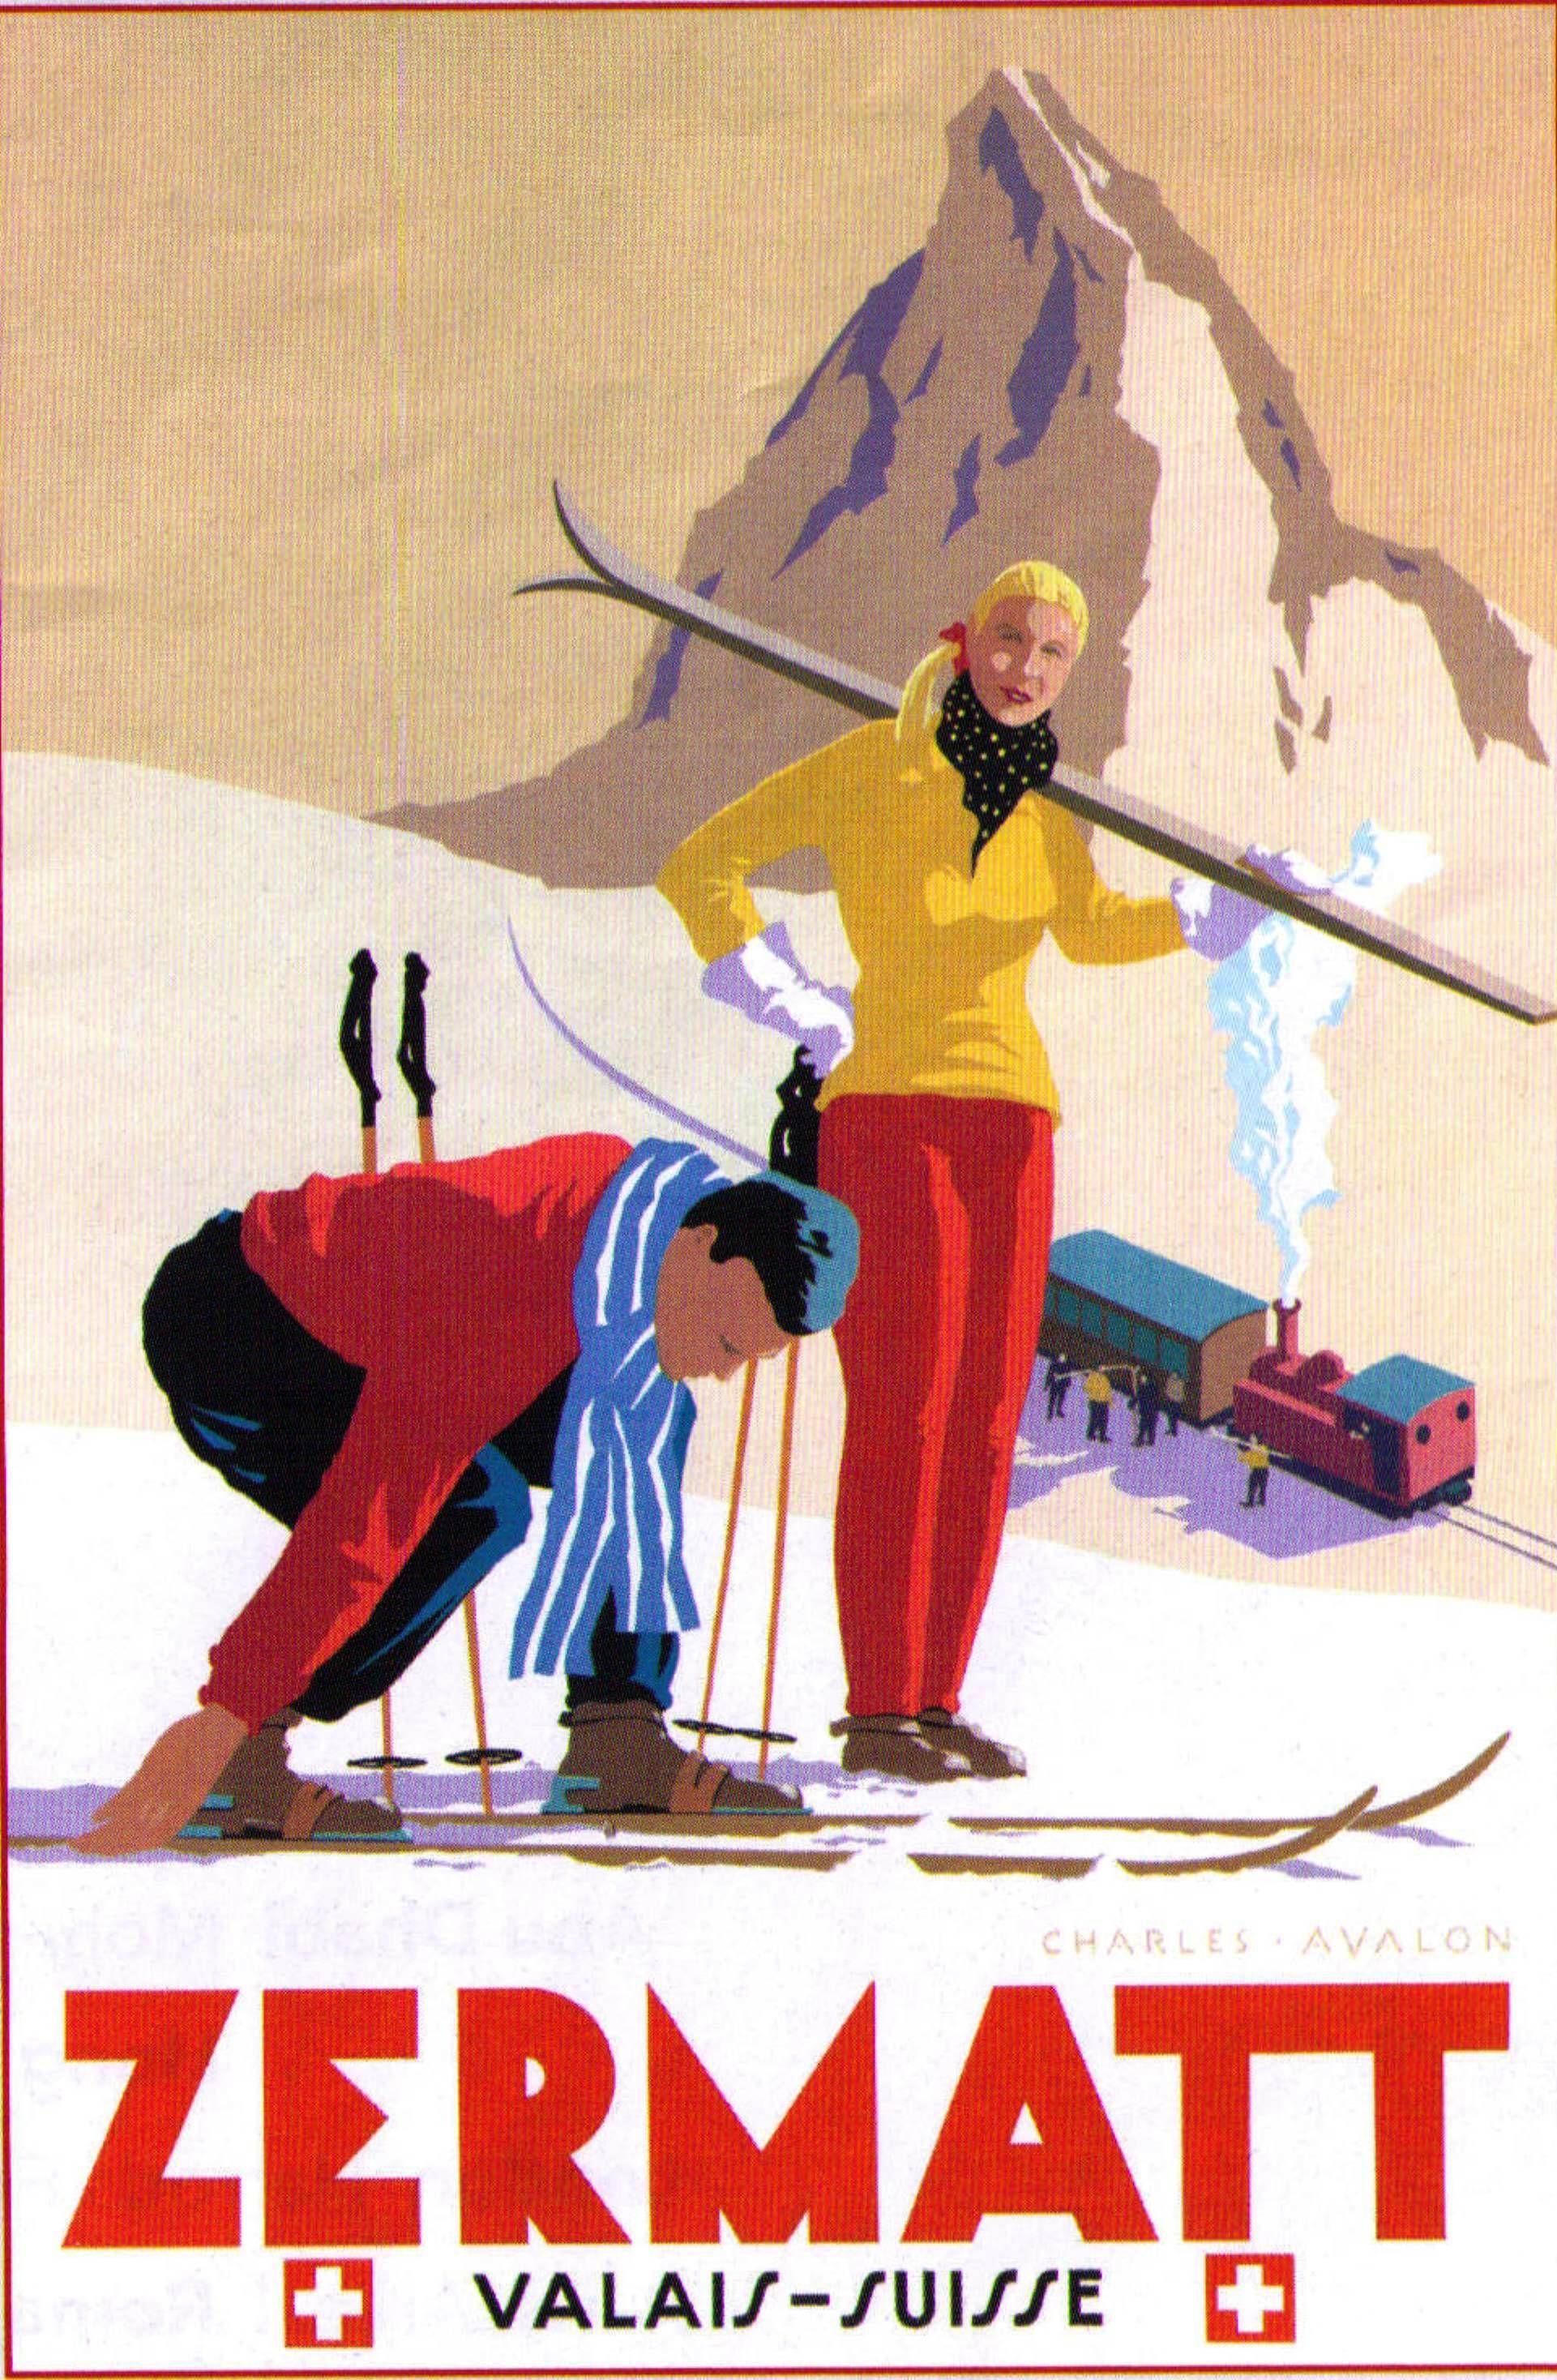 Zermatt Travel Art Poster Print Swiss Wall Decor Xr132 Vintage Ski Posters Ski Posters Vintage Ski